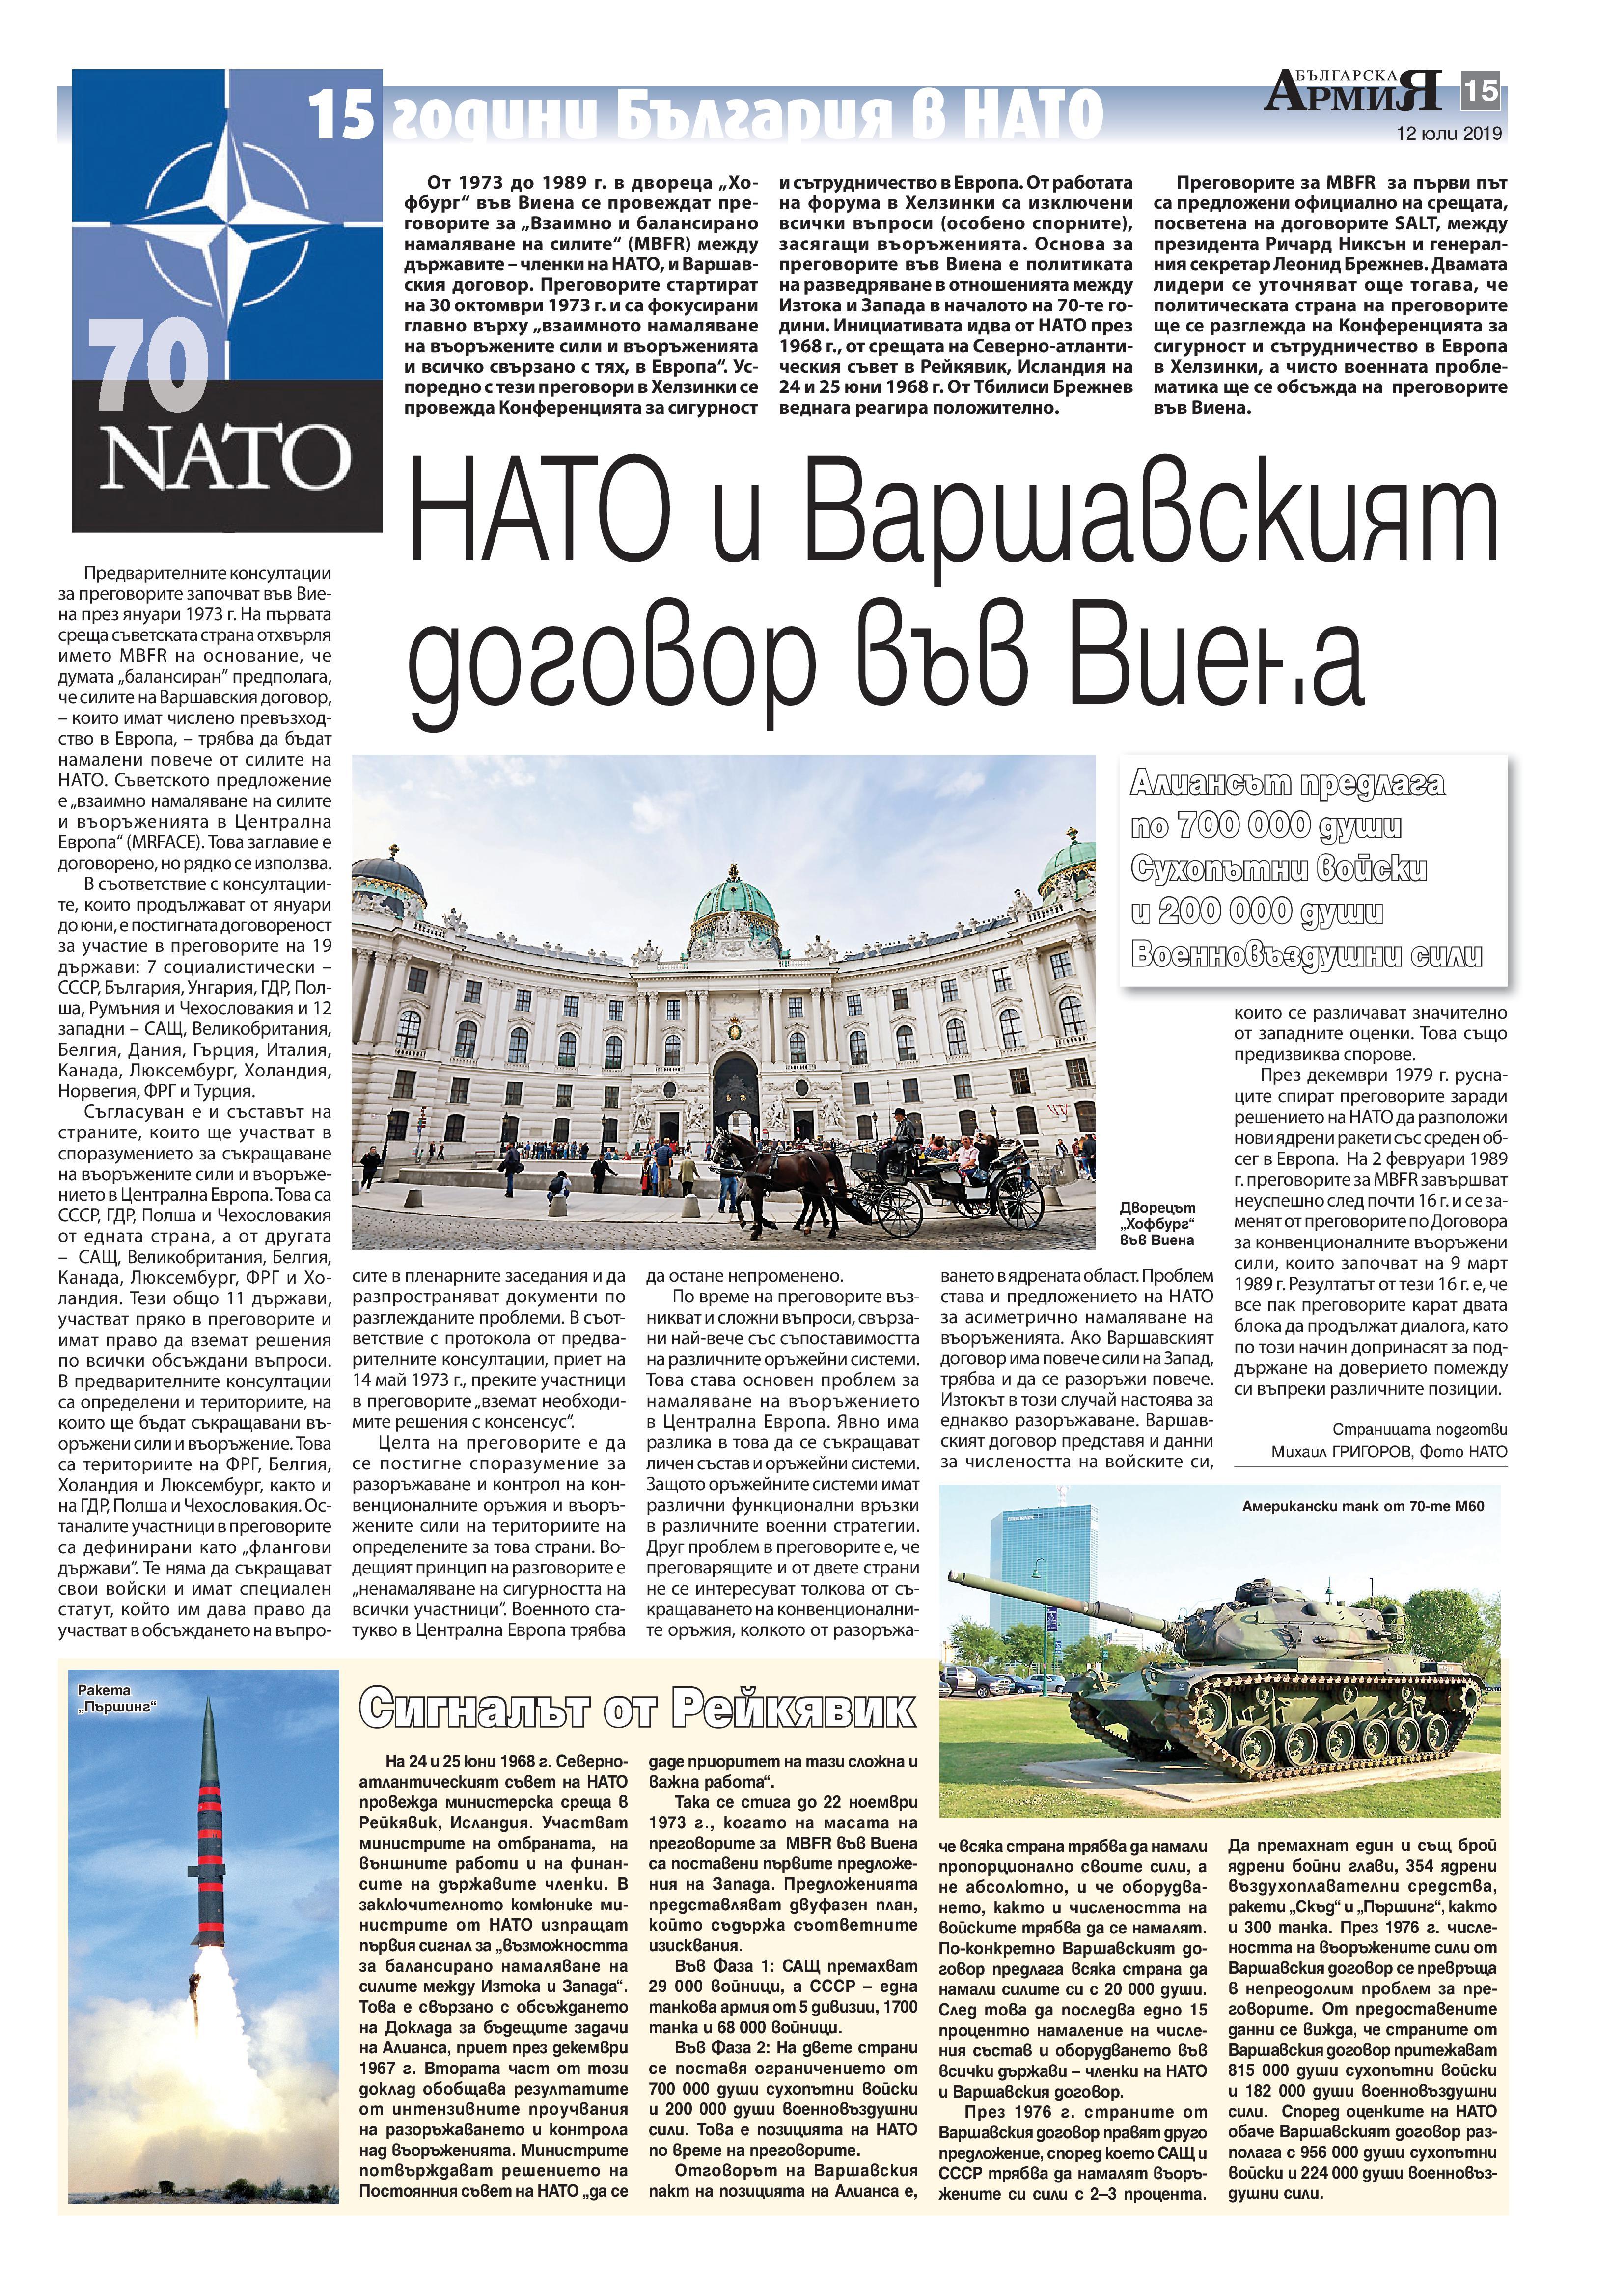 https://www.armymedia.bg/wp-content/uploads/2015/06/15-29.jpg